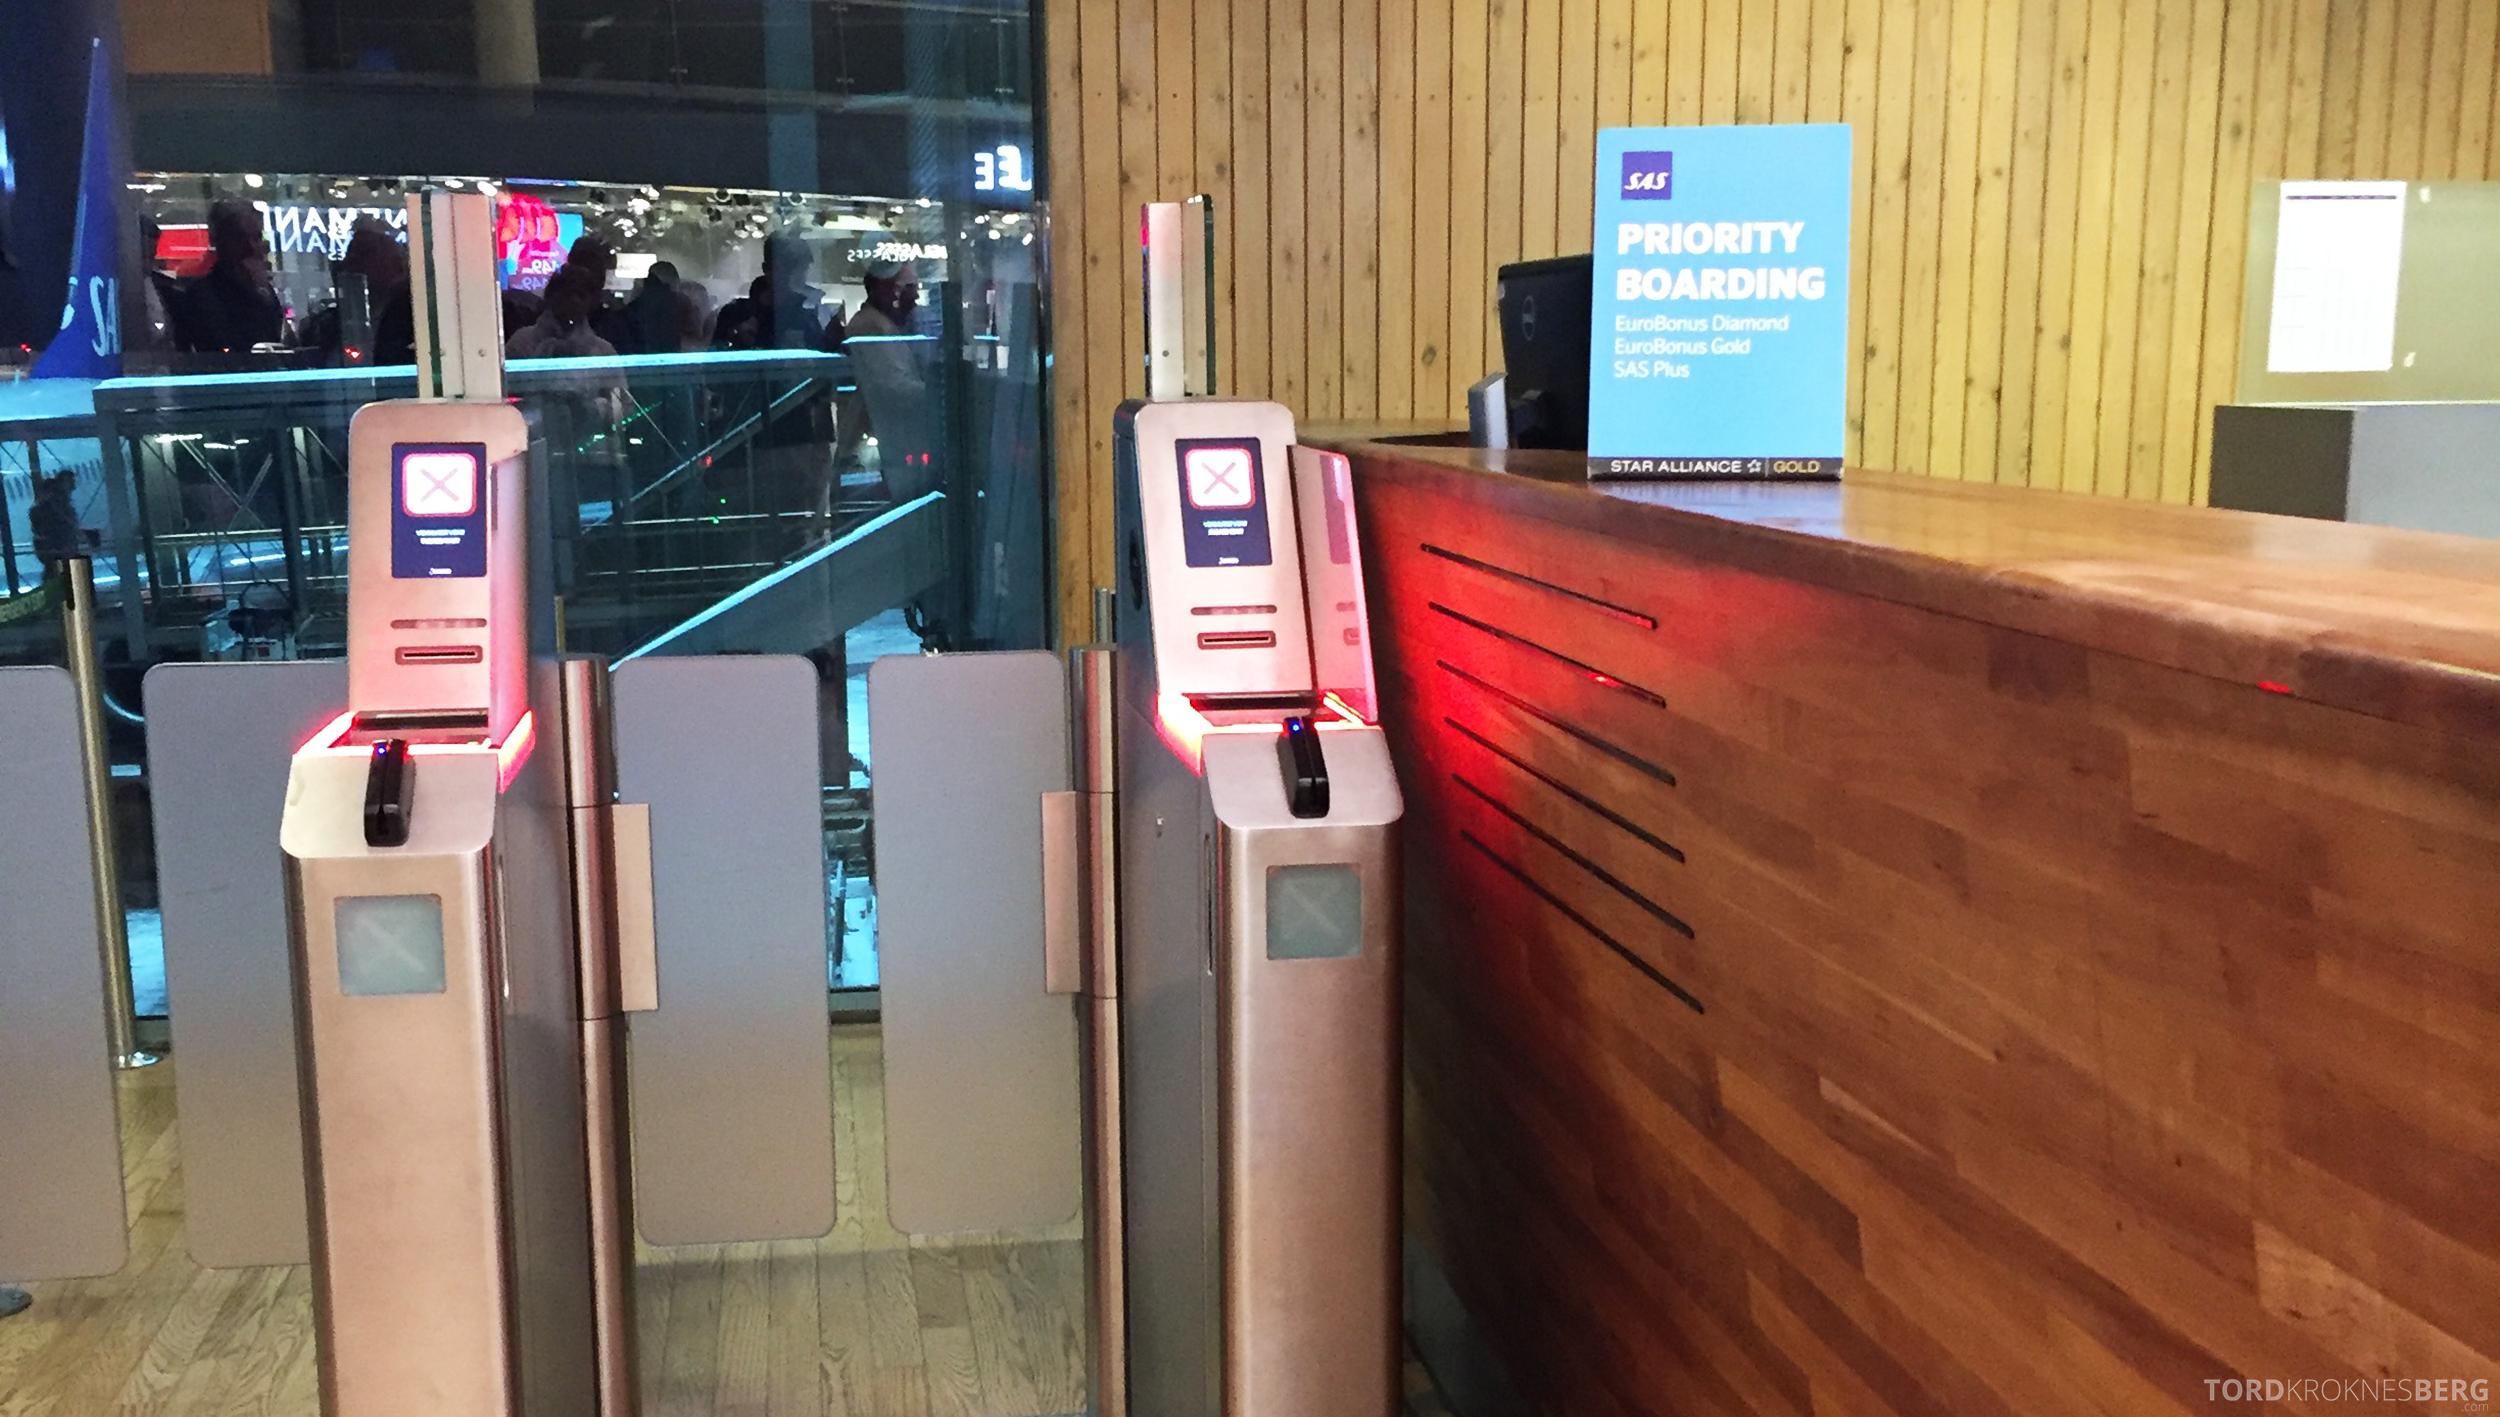 SAS Plus Oslo Malaga prioritert ombordstigning